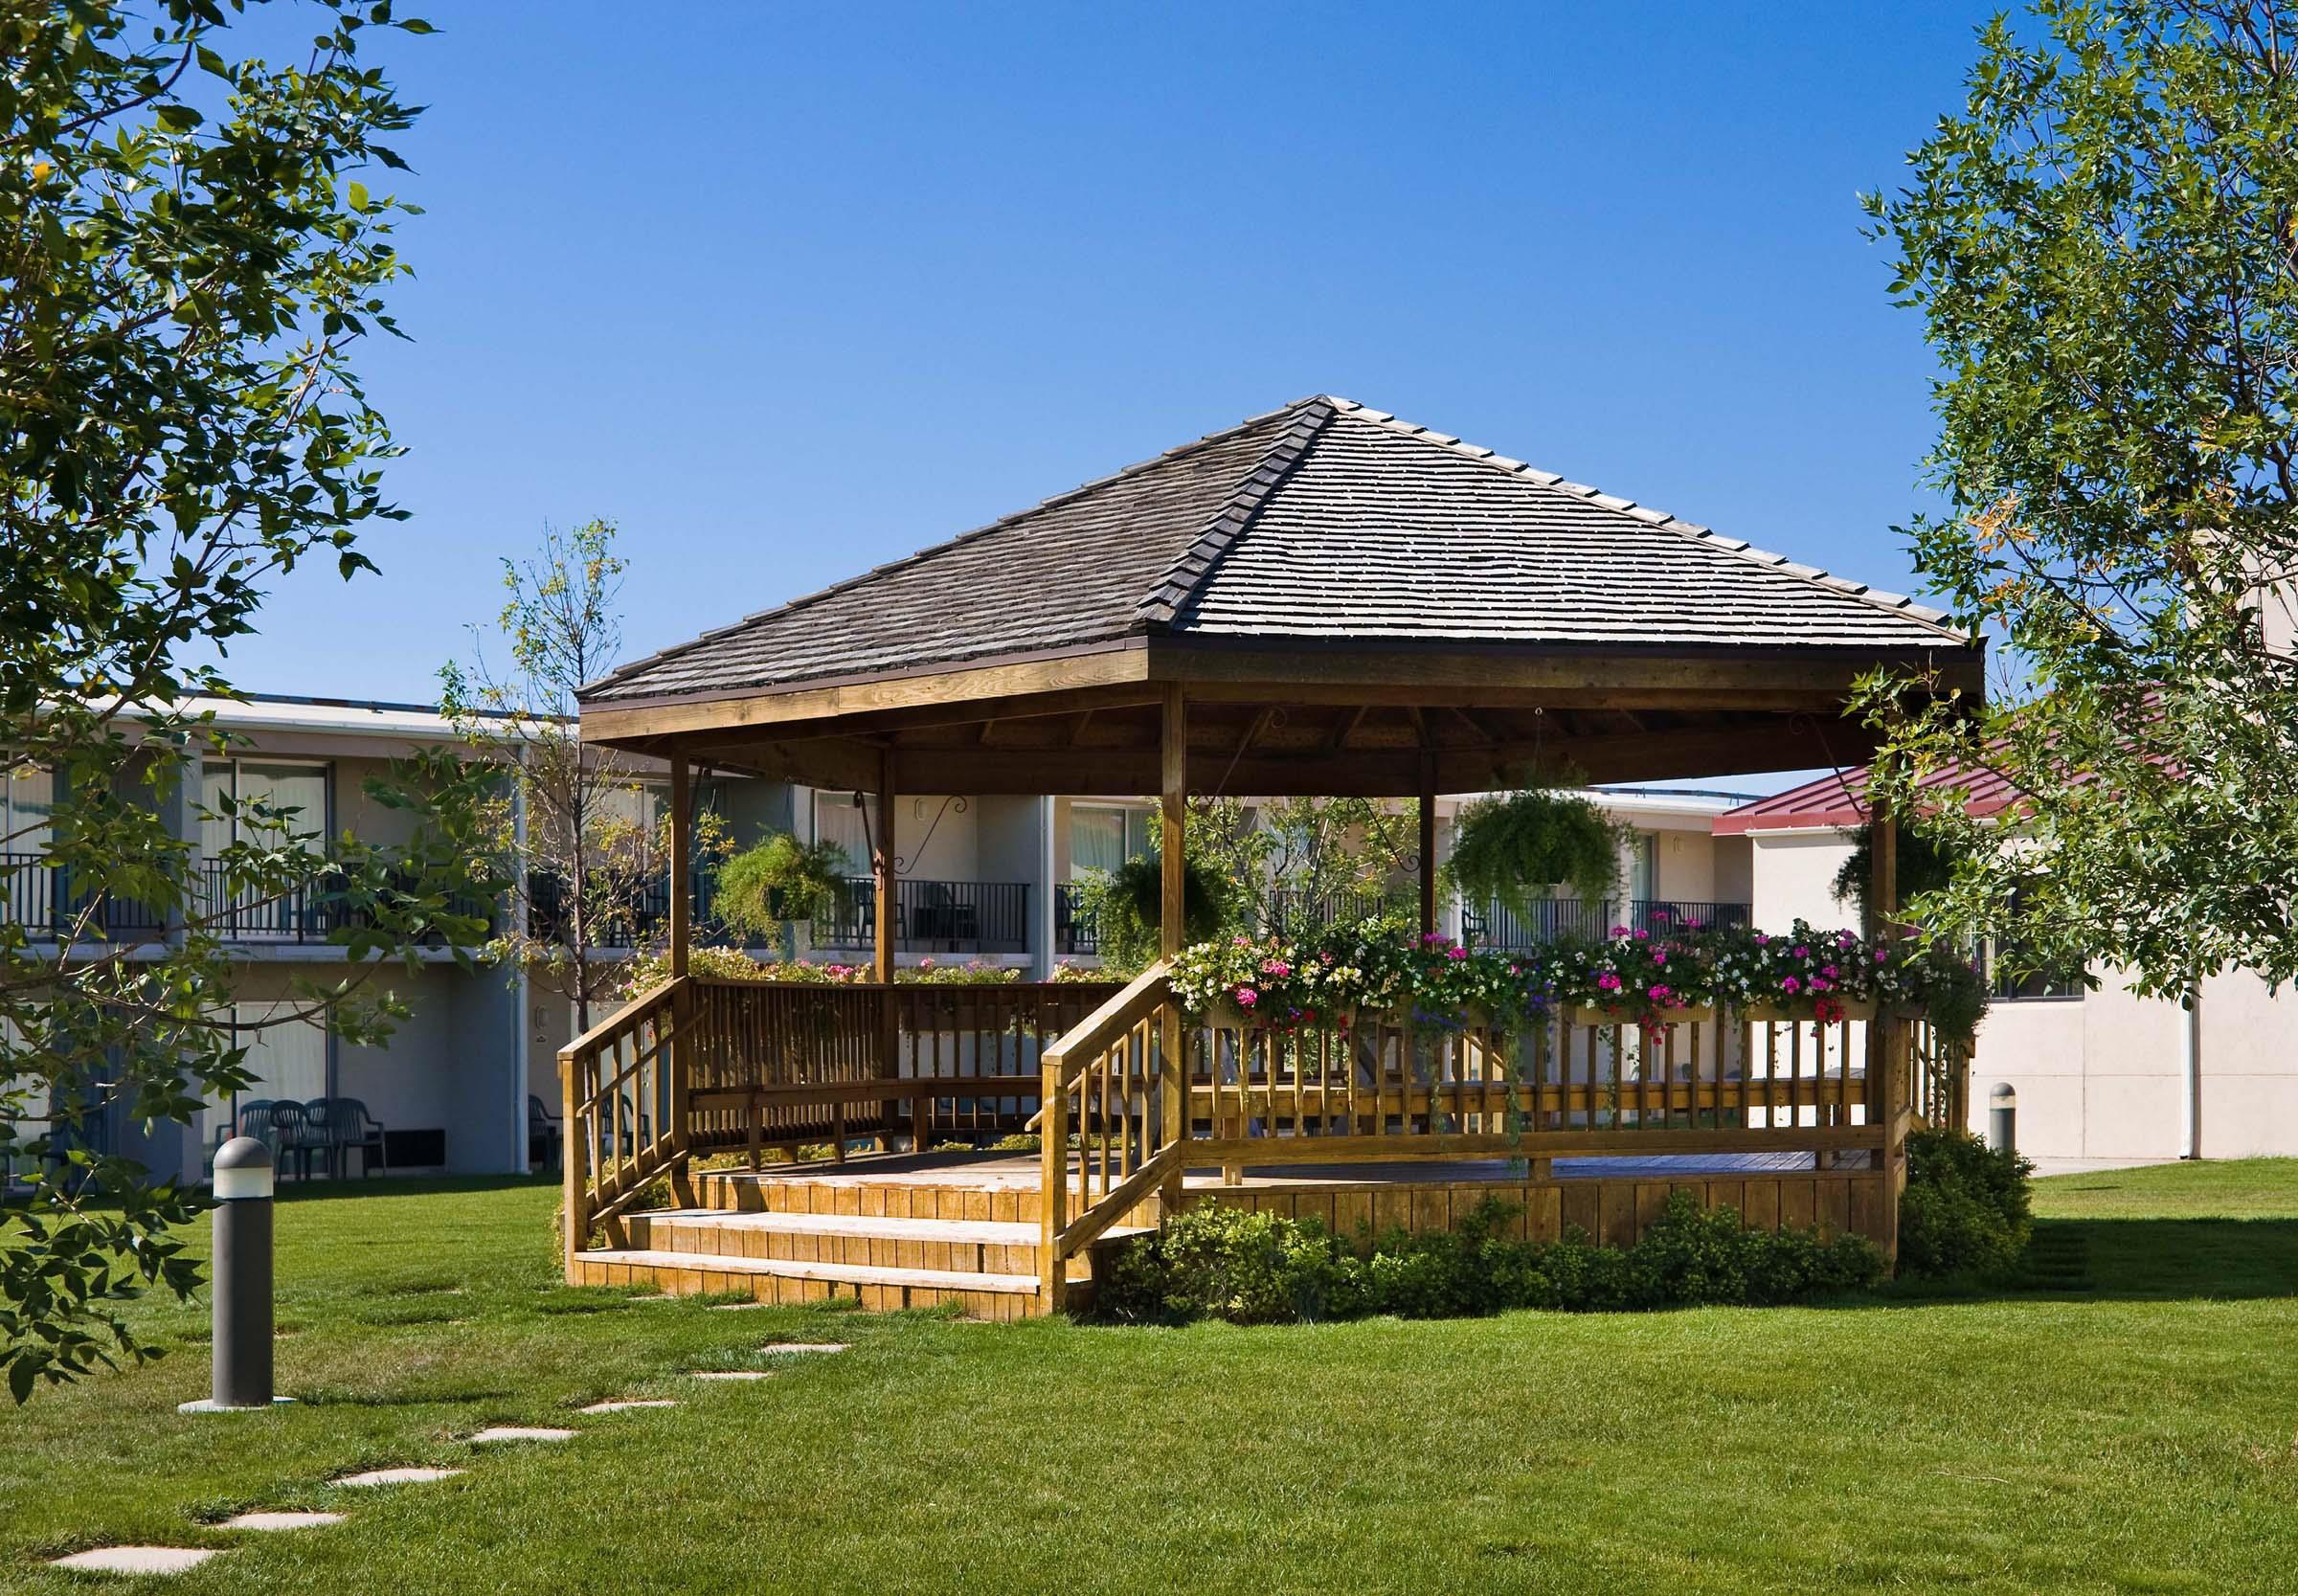 Best Western Ramkota Hotel image 22